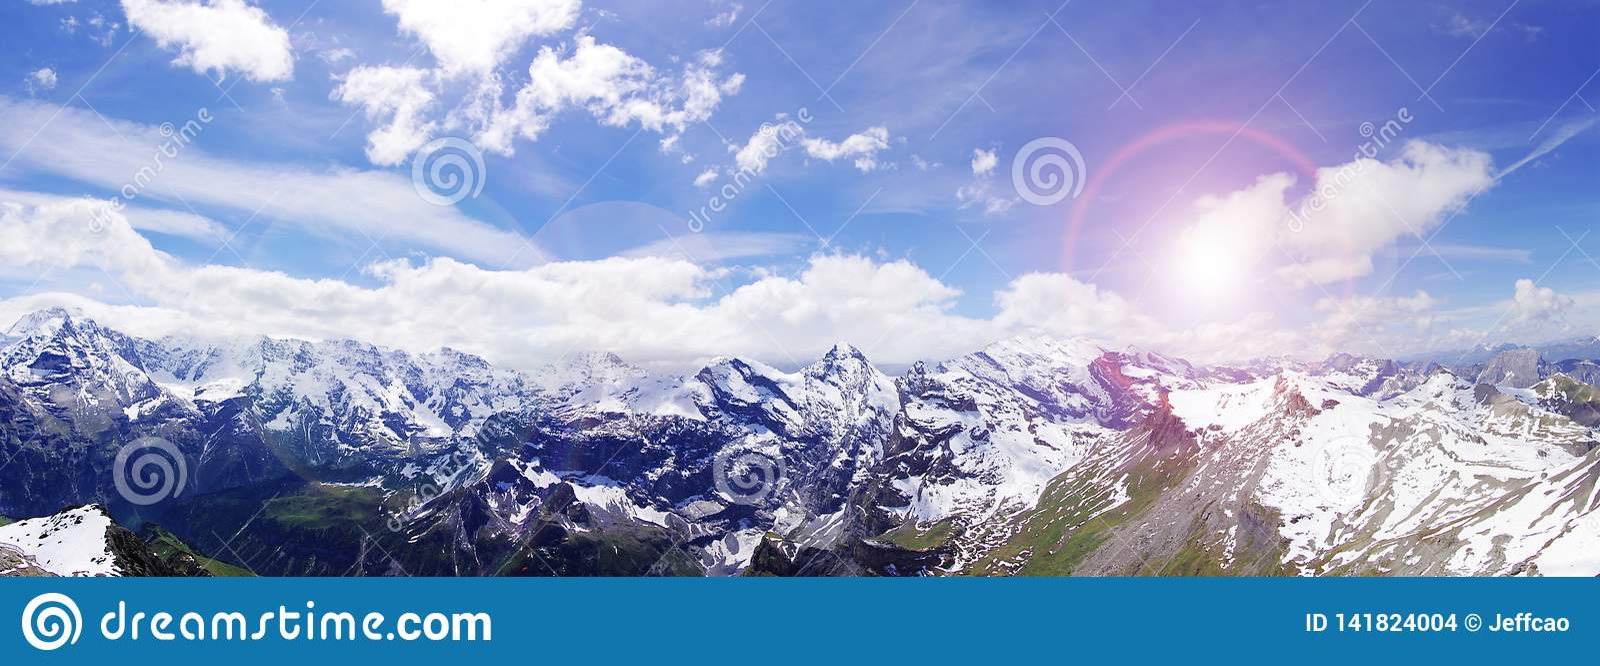 Les Alpes magnifiques